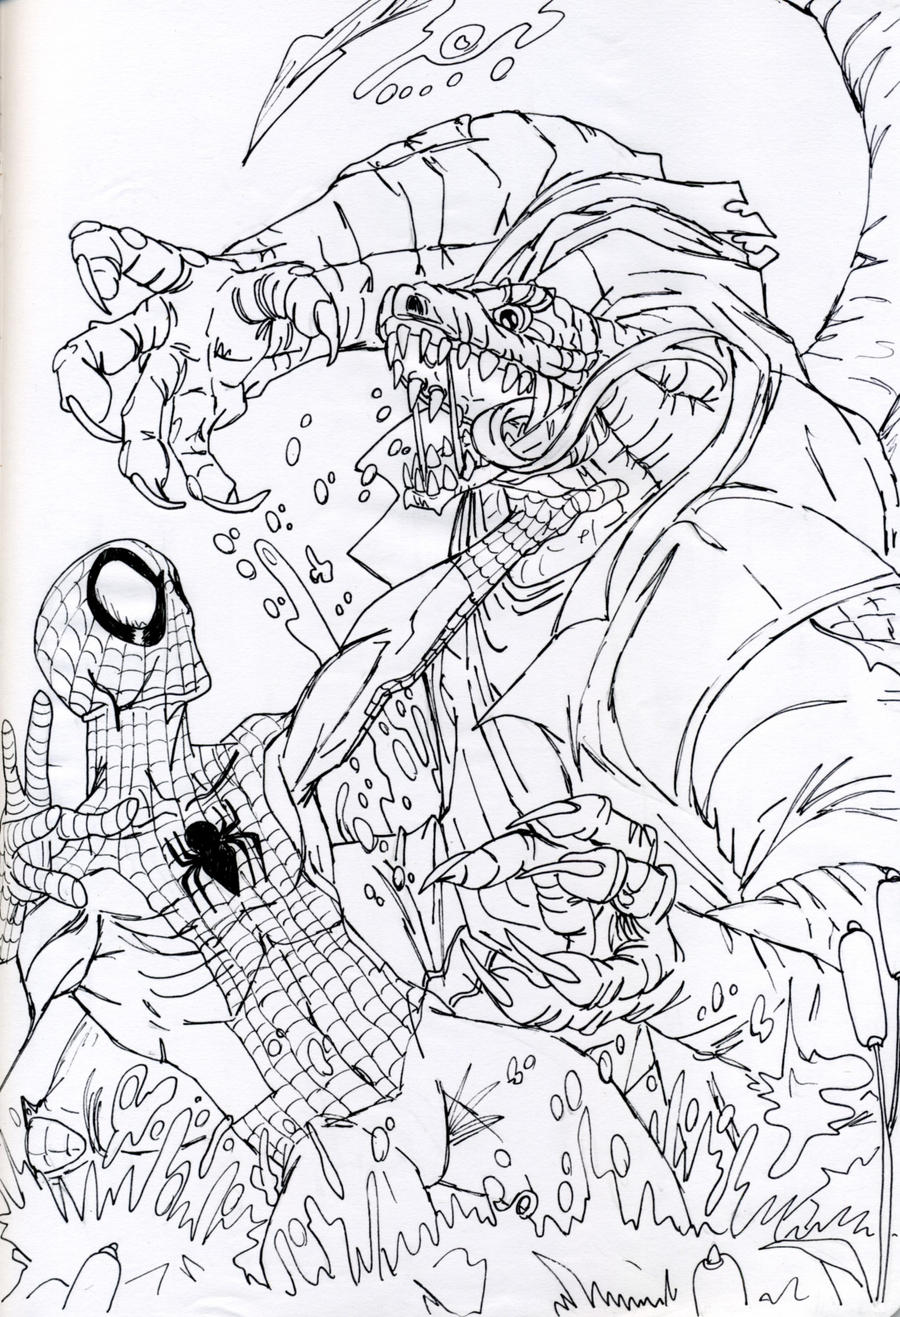 Spiderman vs Lizard by DitaDiPolvere on DeviantArt